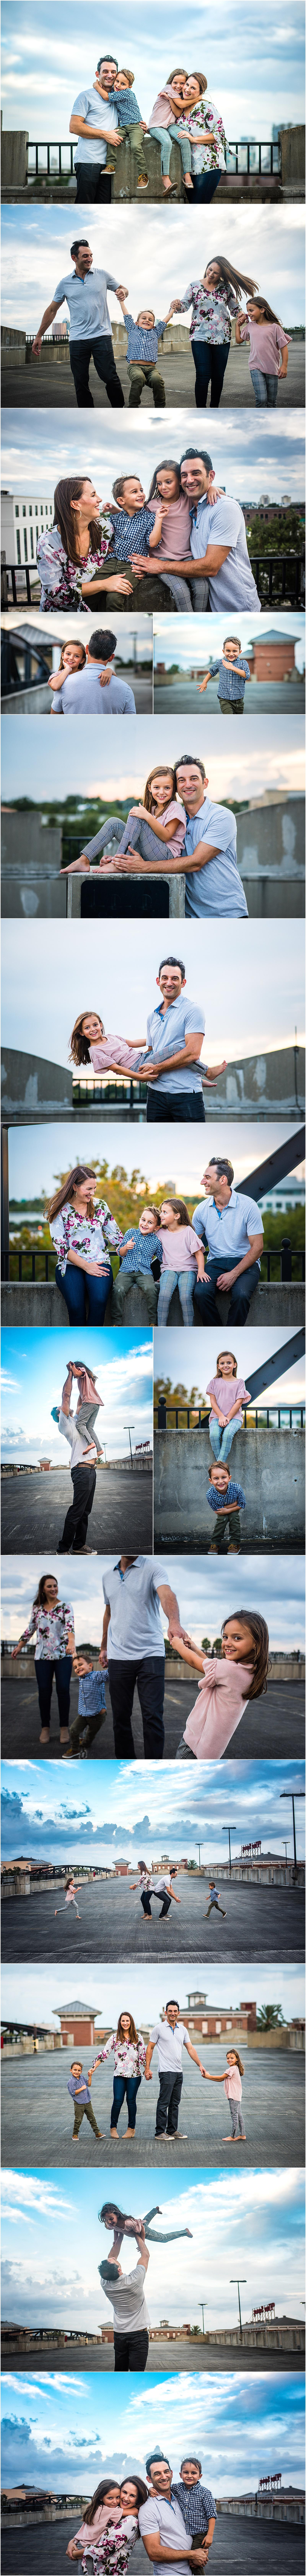 Family_Ybor_3.jpg